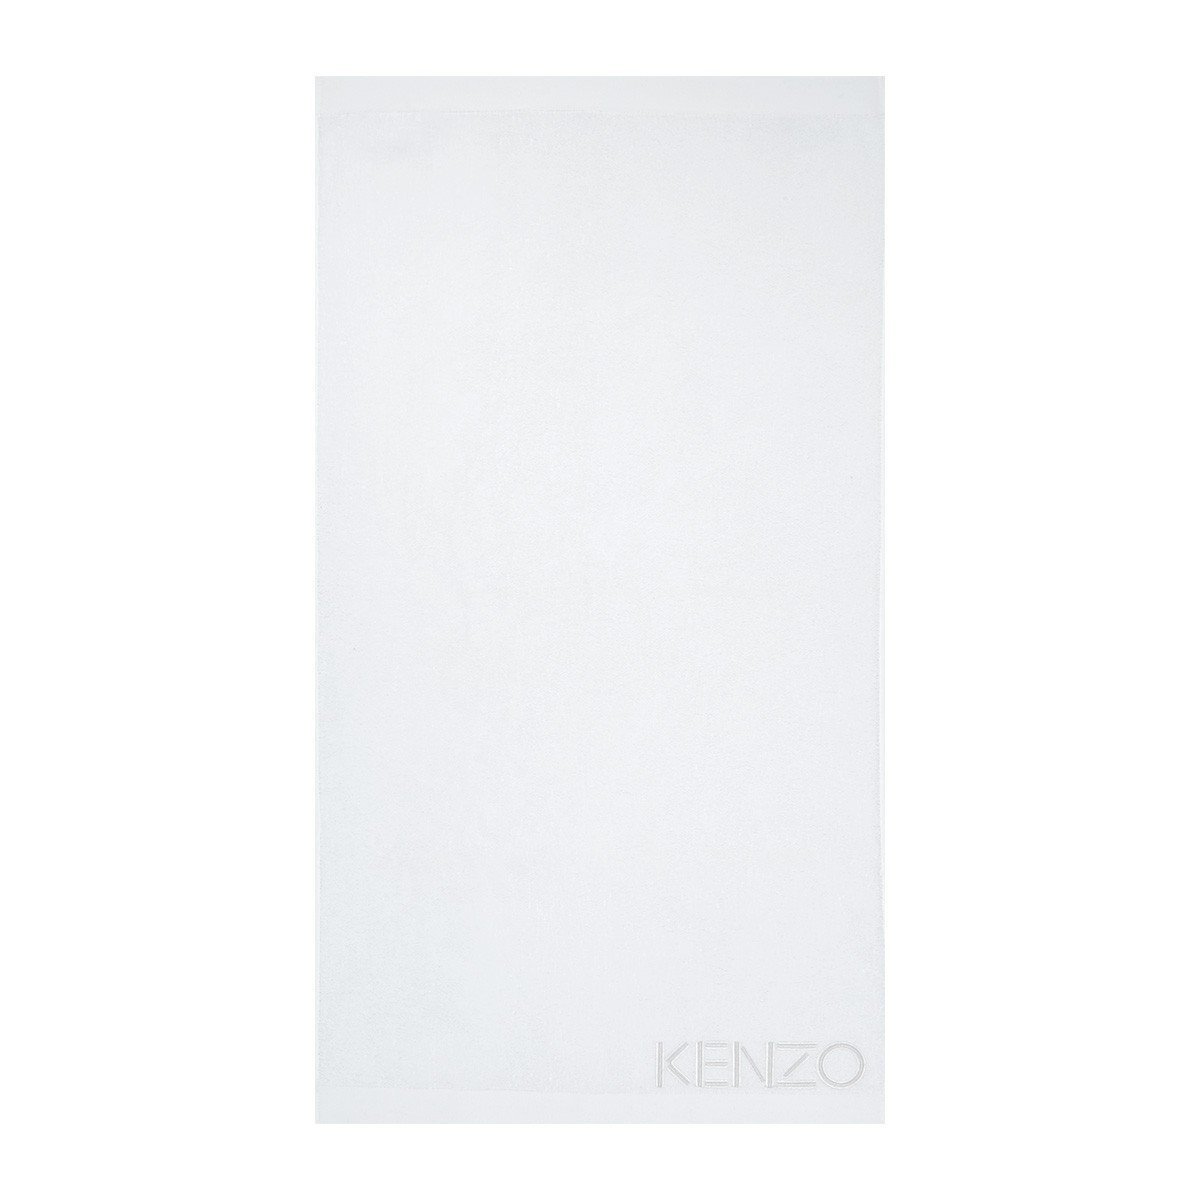 Iconic Bath Sheet